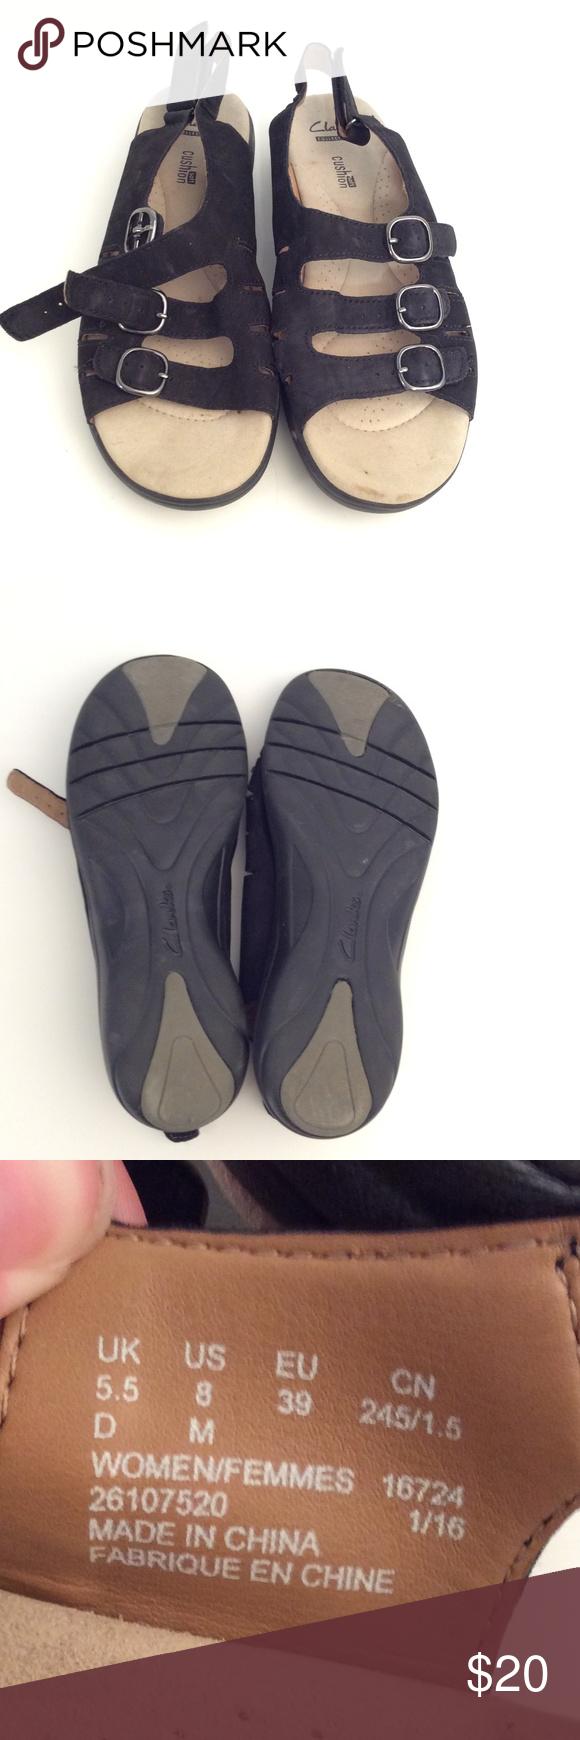 Sandale Damen Clarks Gr. 39,5